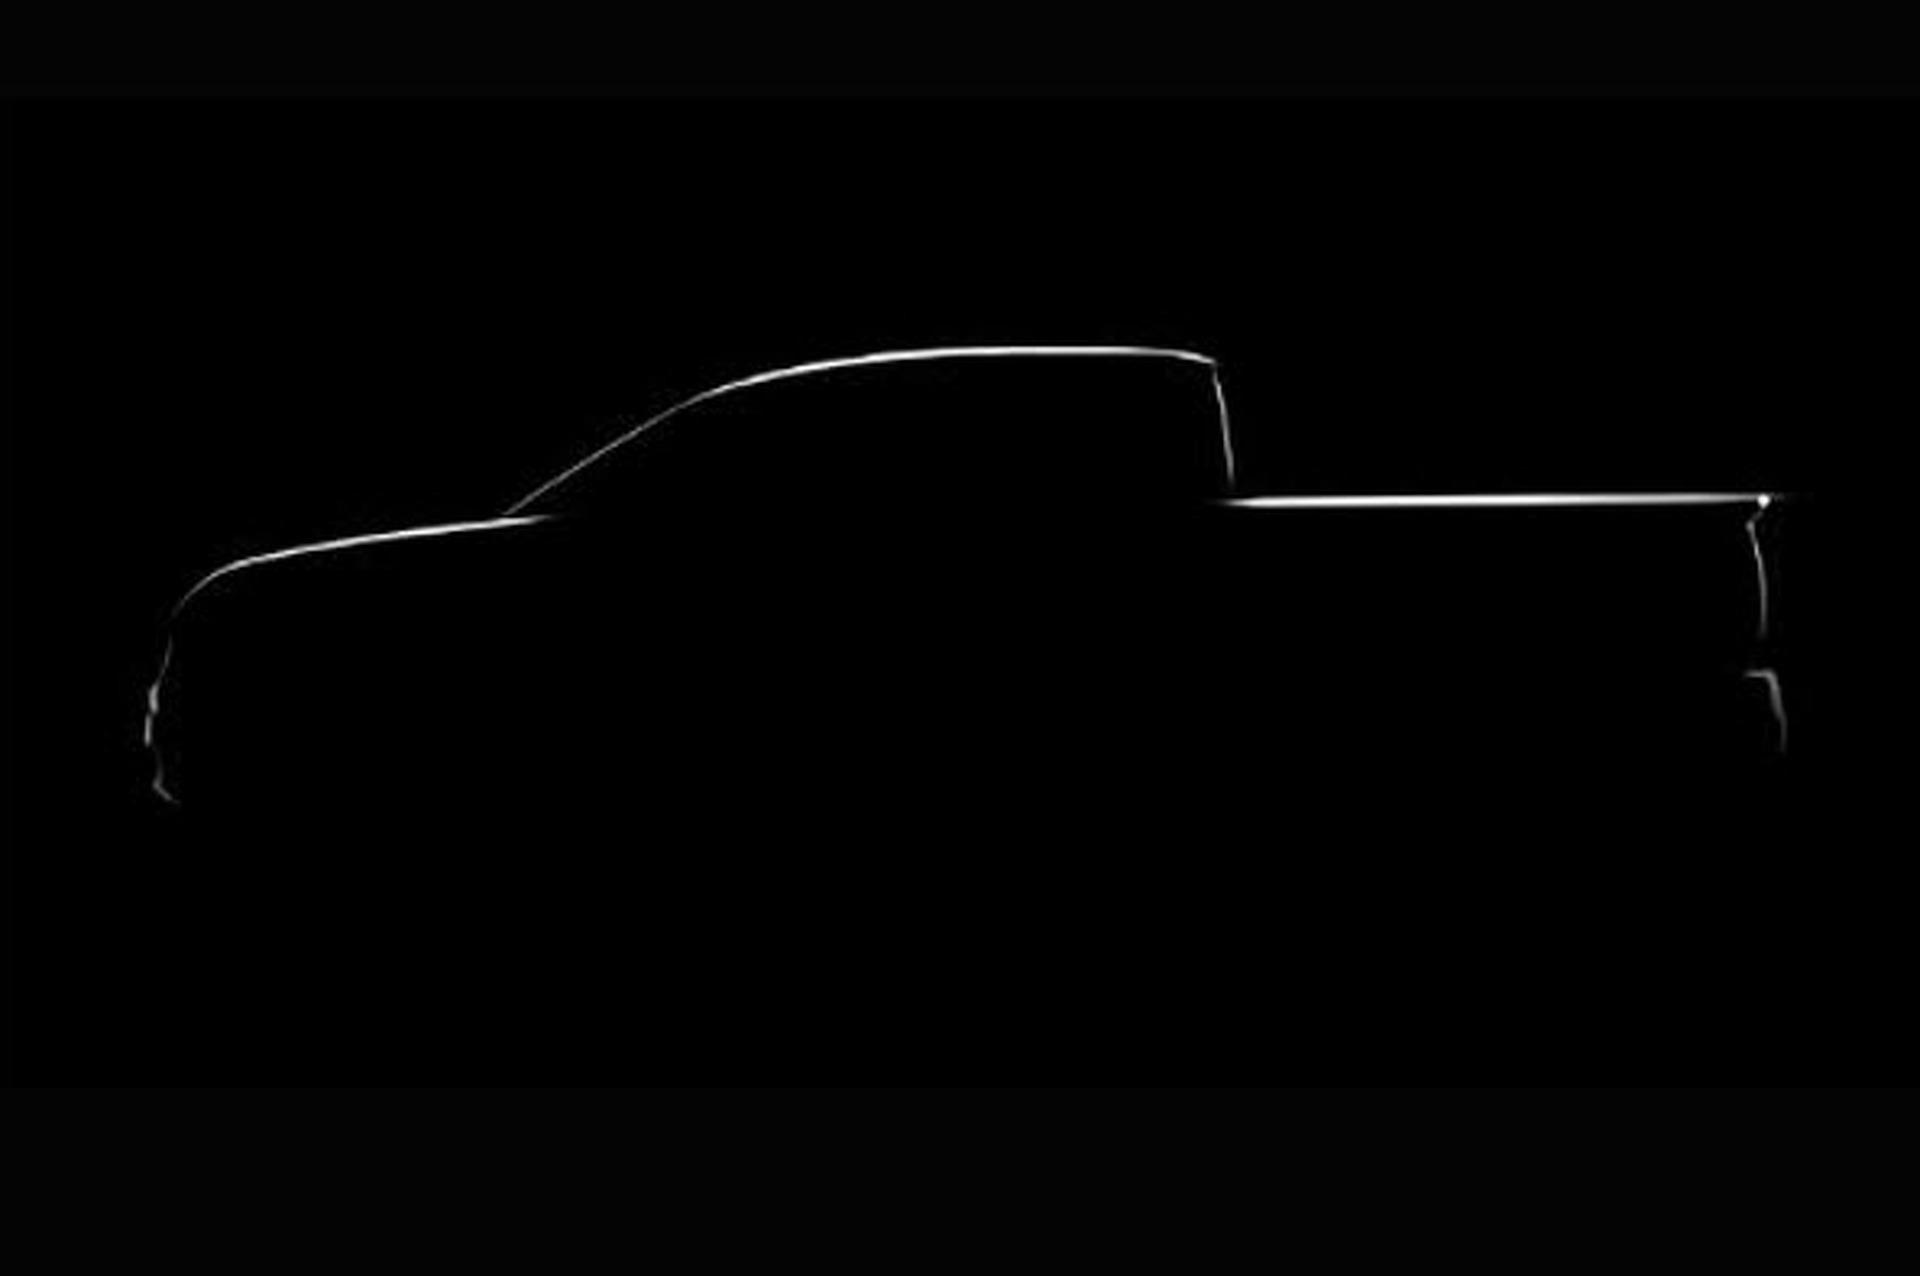 Shocker: Honda Announces a New Ridgeline in 2 Years